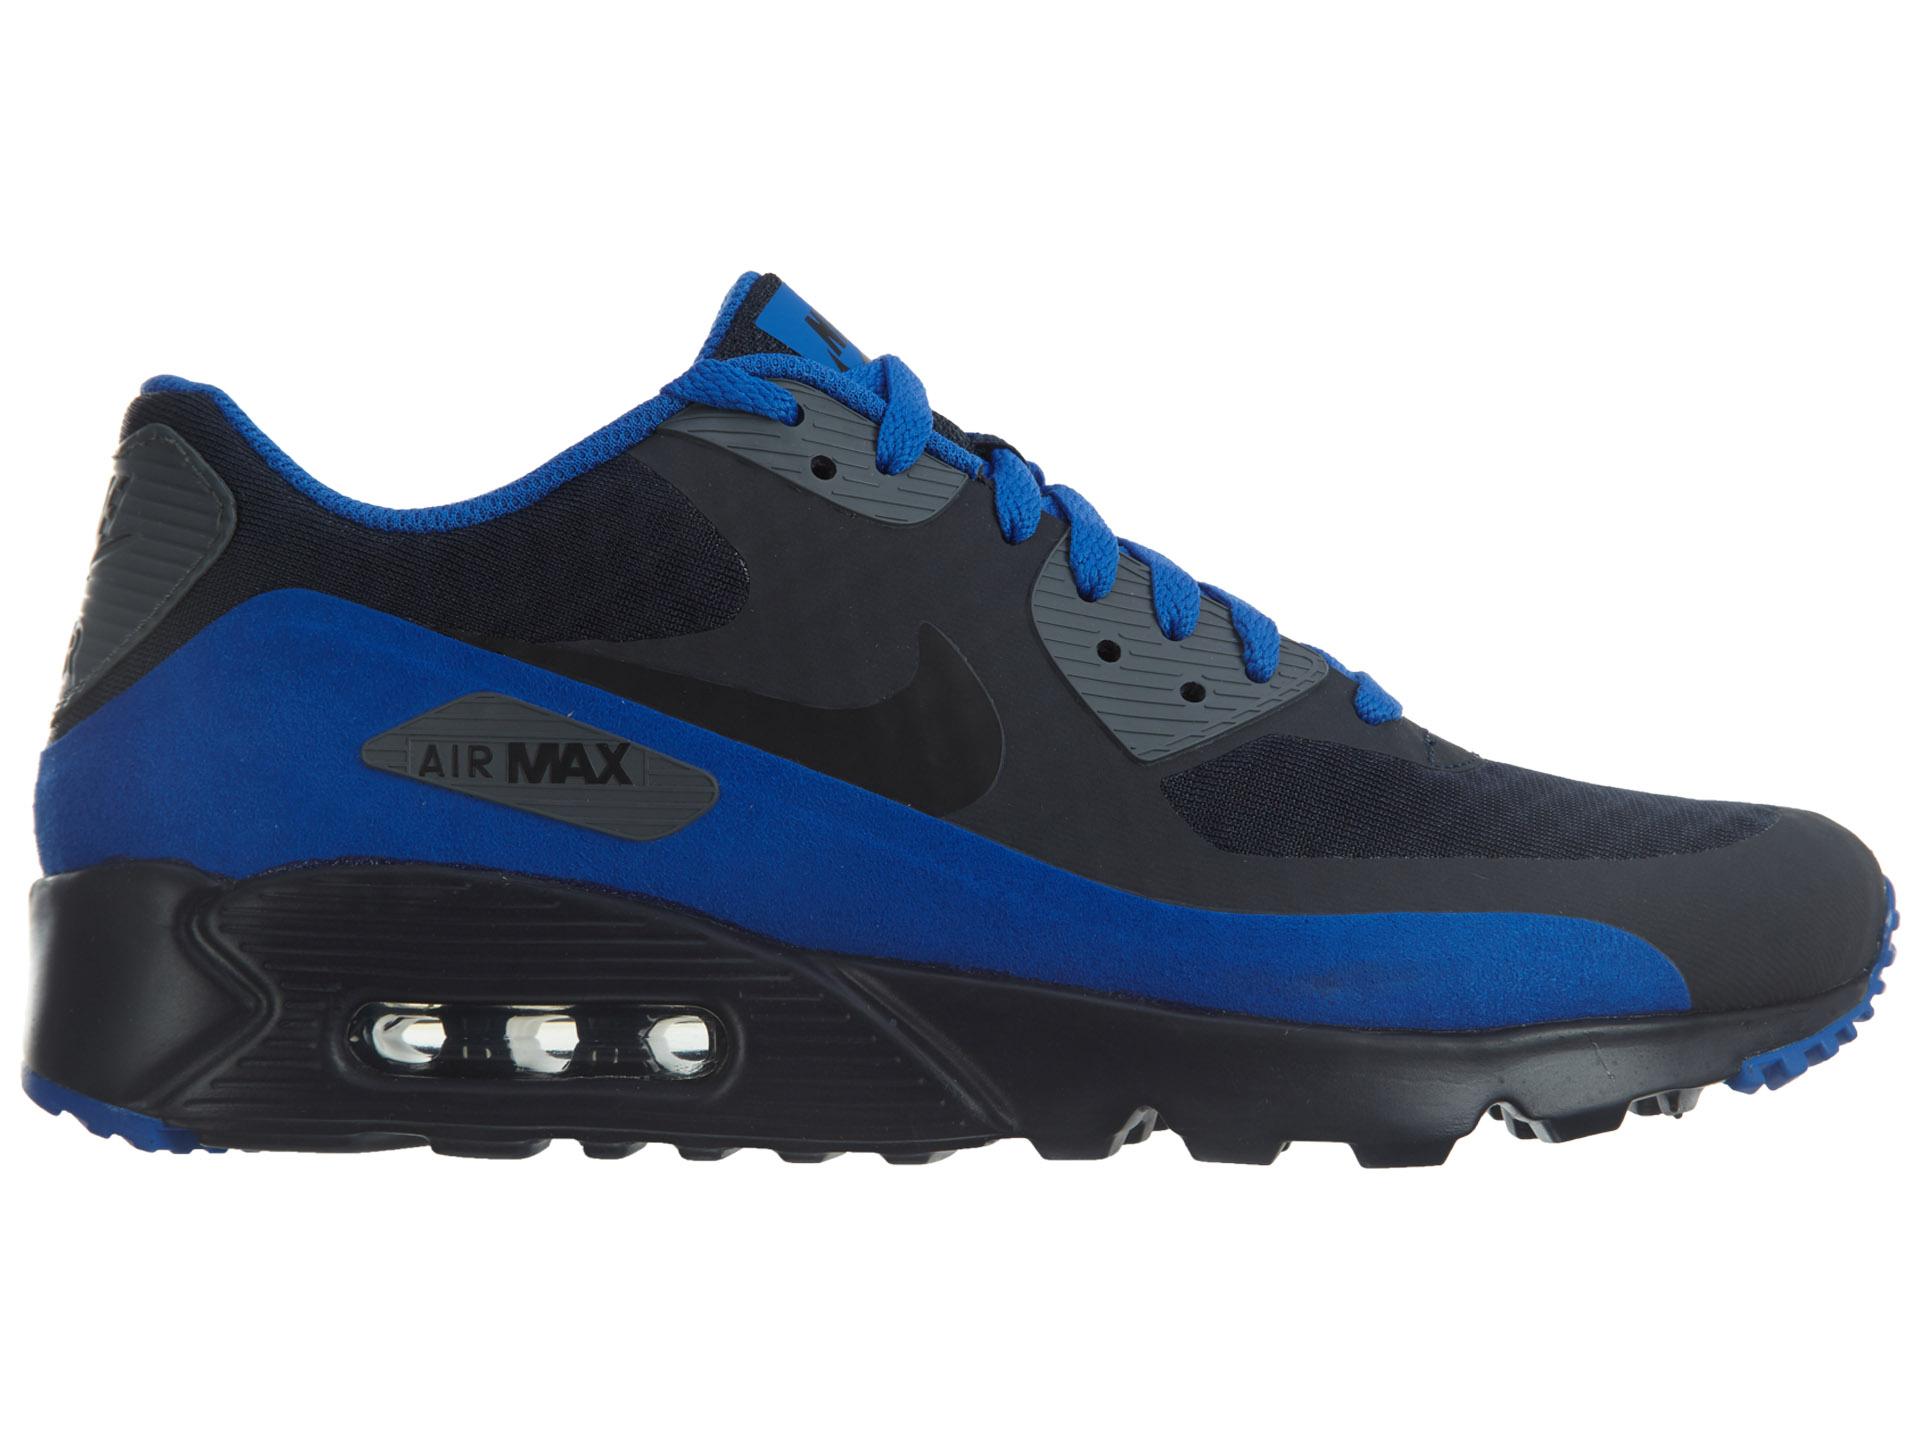 Nike Air Max 90 Ultra Essential Dark Obsidian/Black - 819474-403